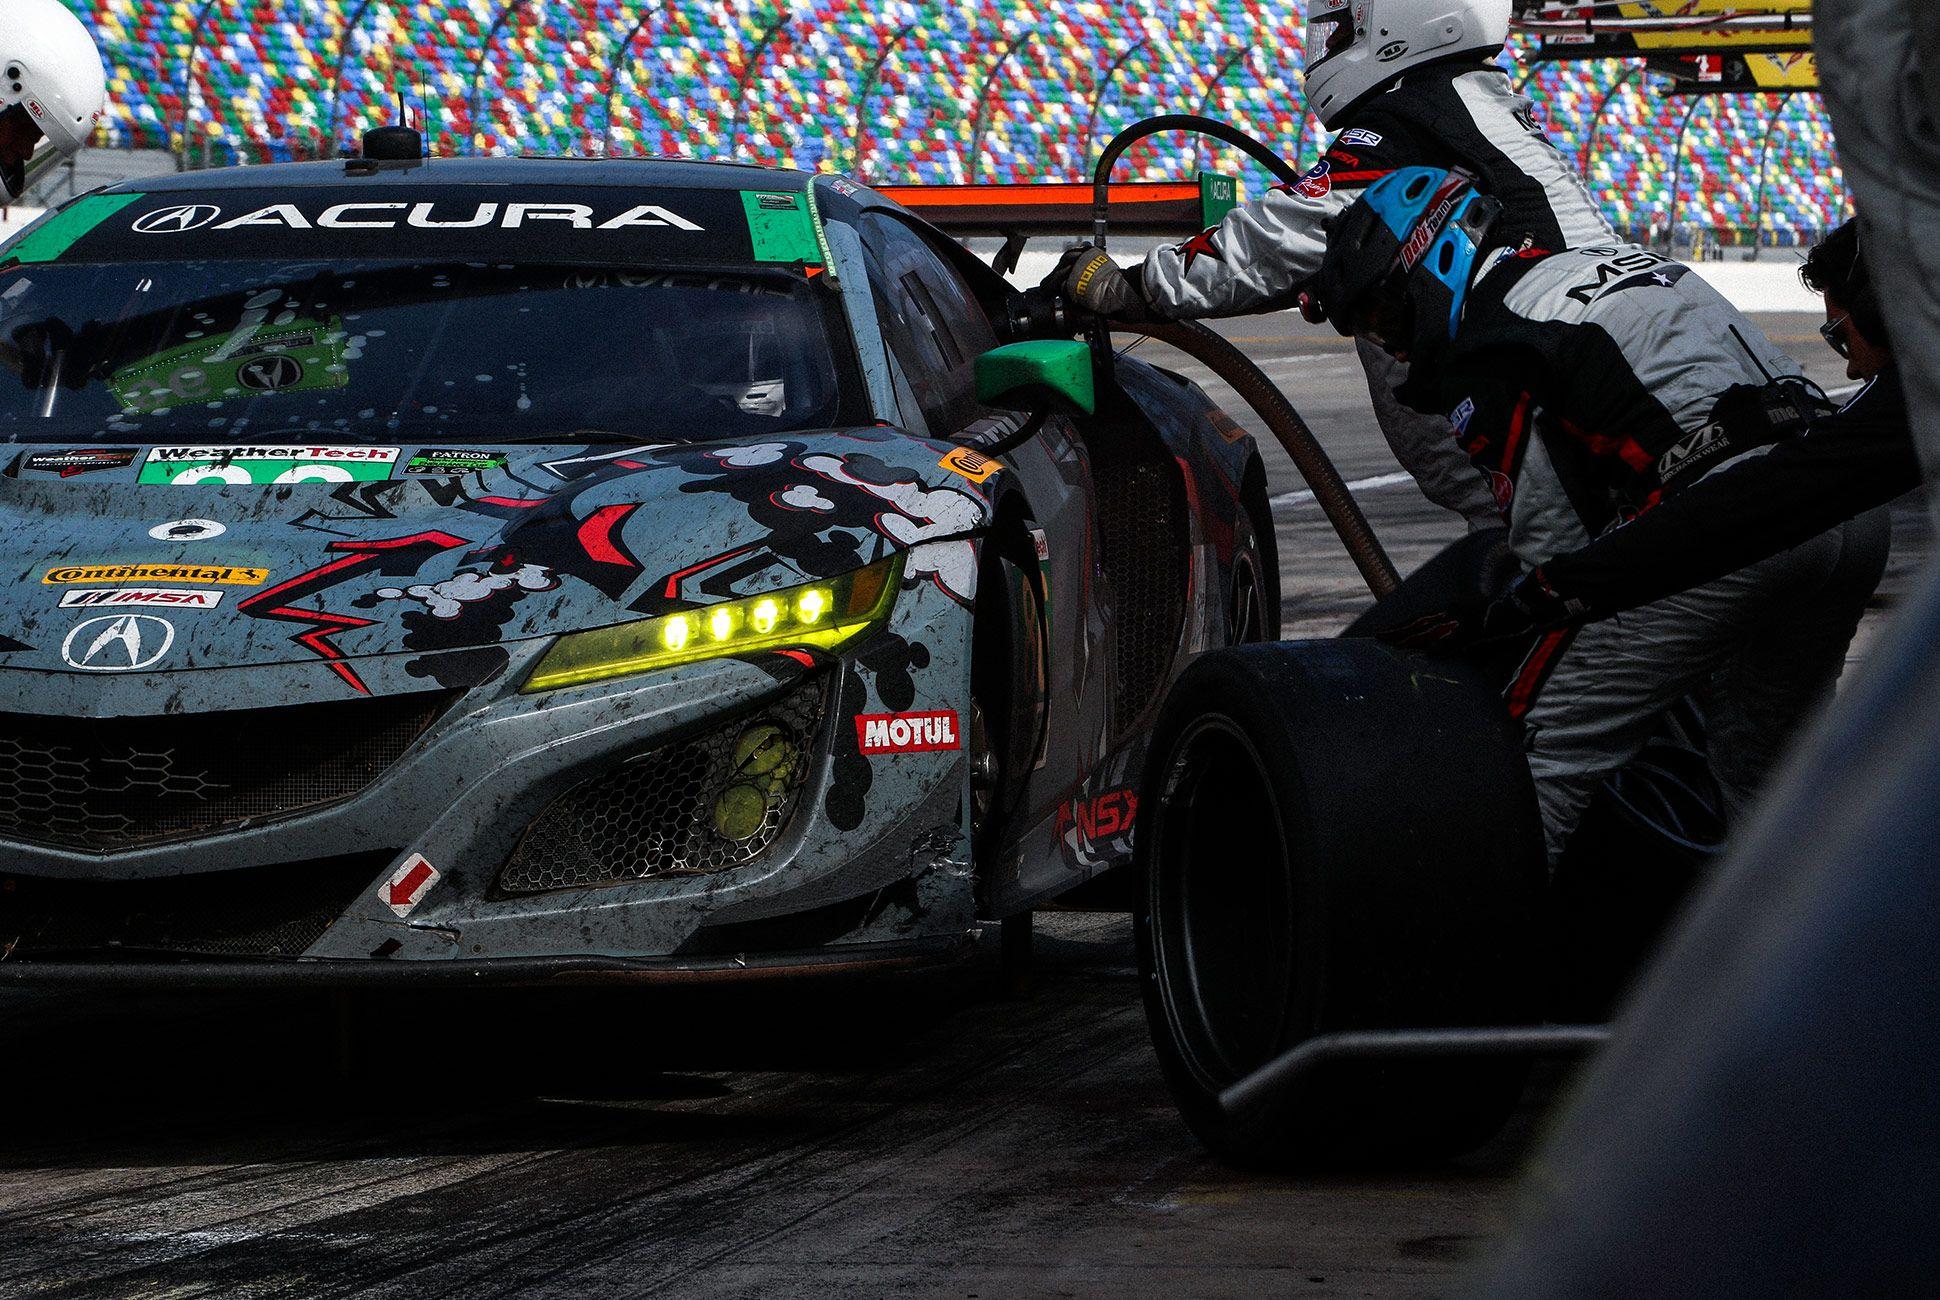 Best-Sports-Cars-of-2018-Daytona-24-Hours-gear-patrol-Acura-NSX-GT3-1